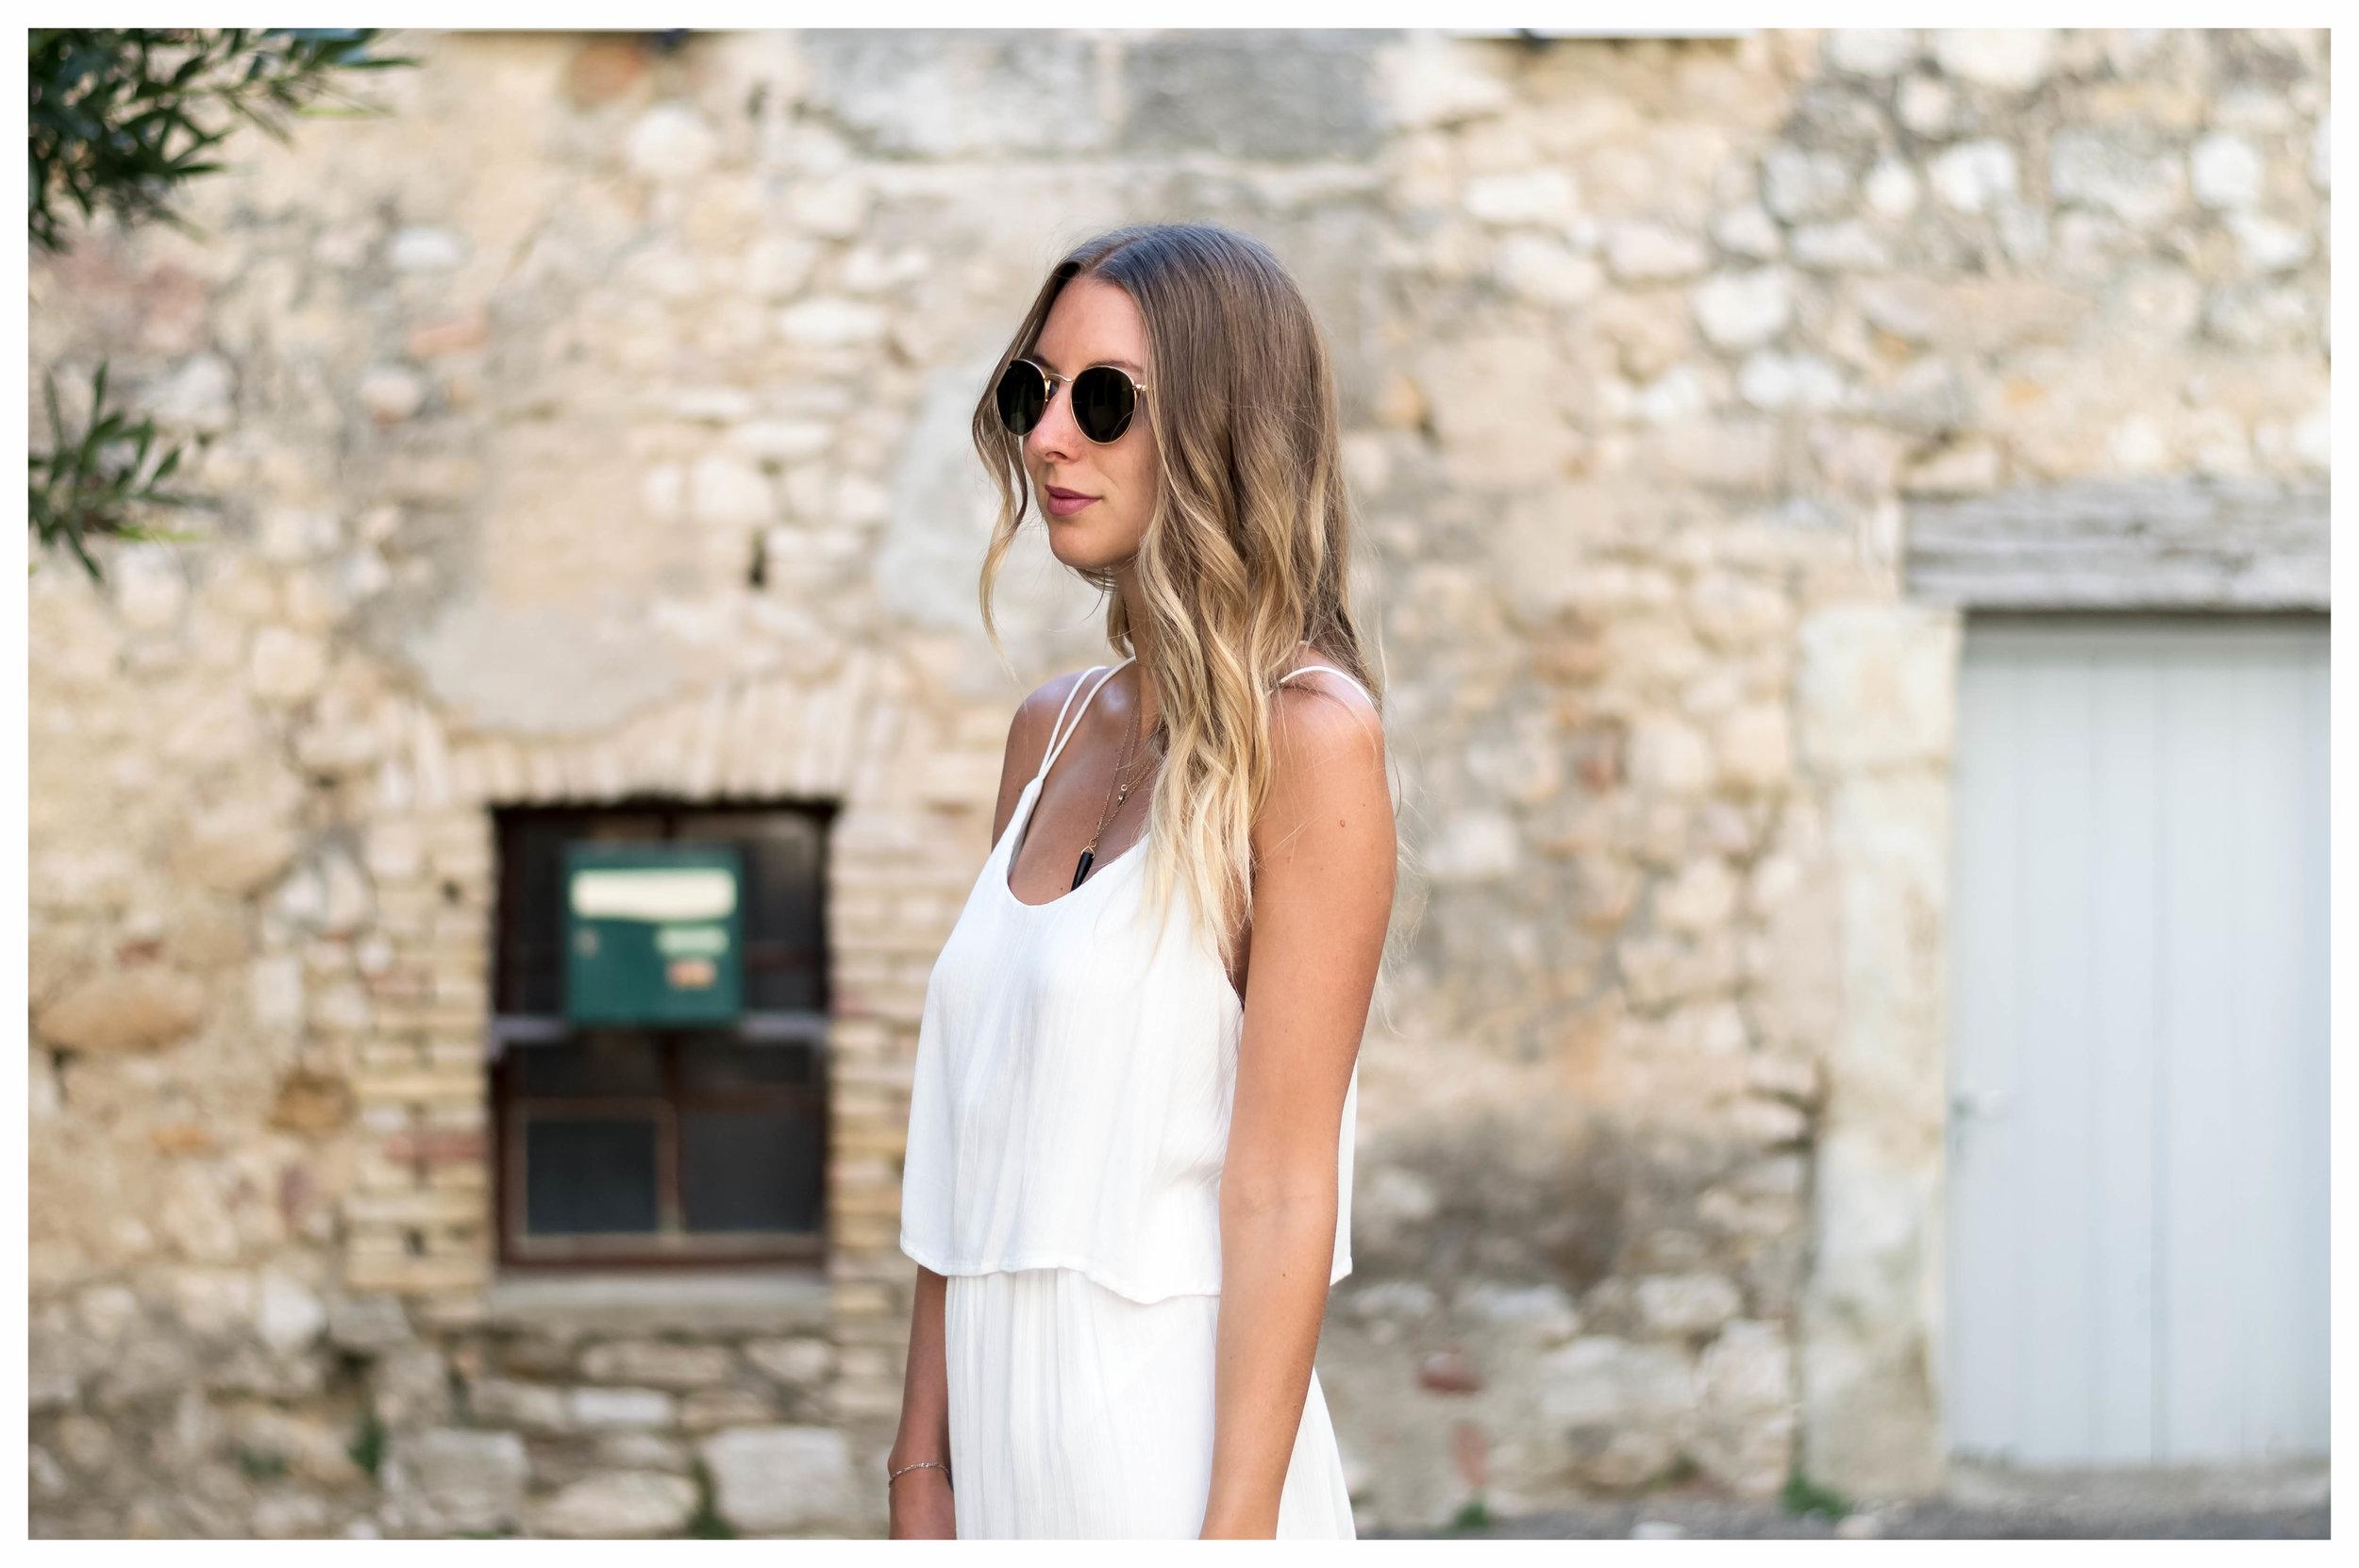 White Dress - OSIARAH.COM (1 sur 16).jpg